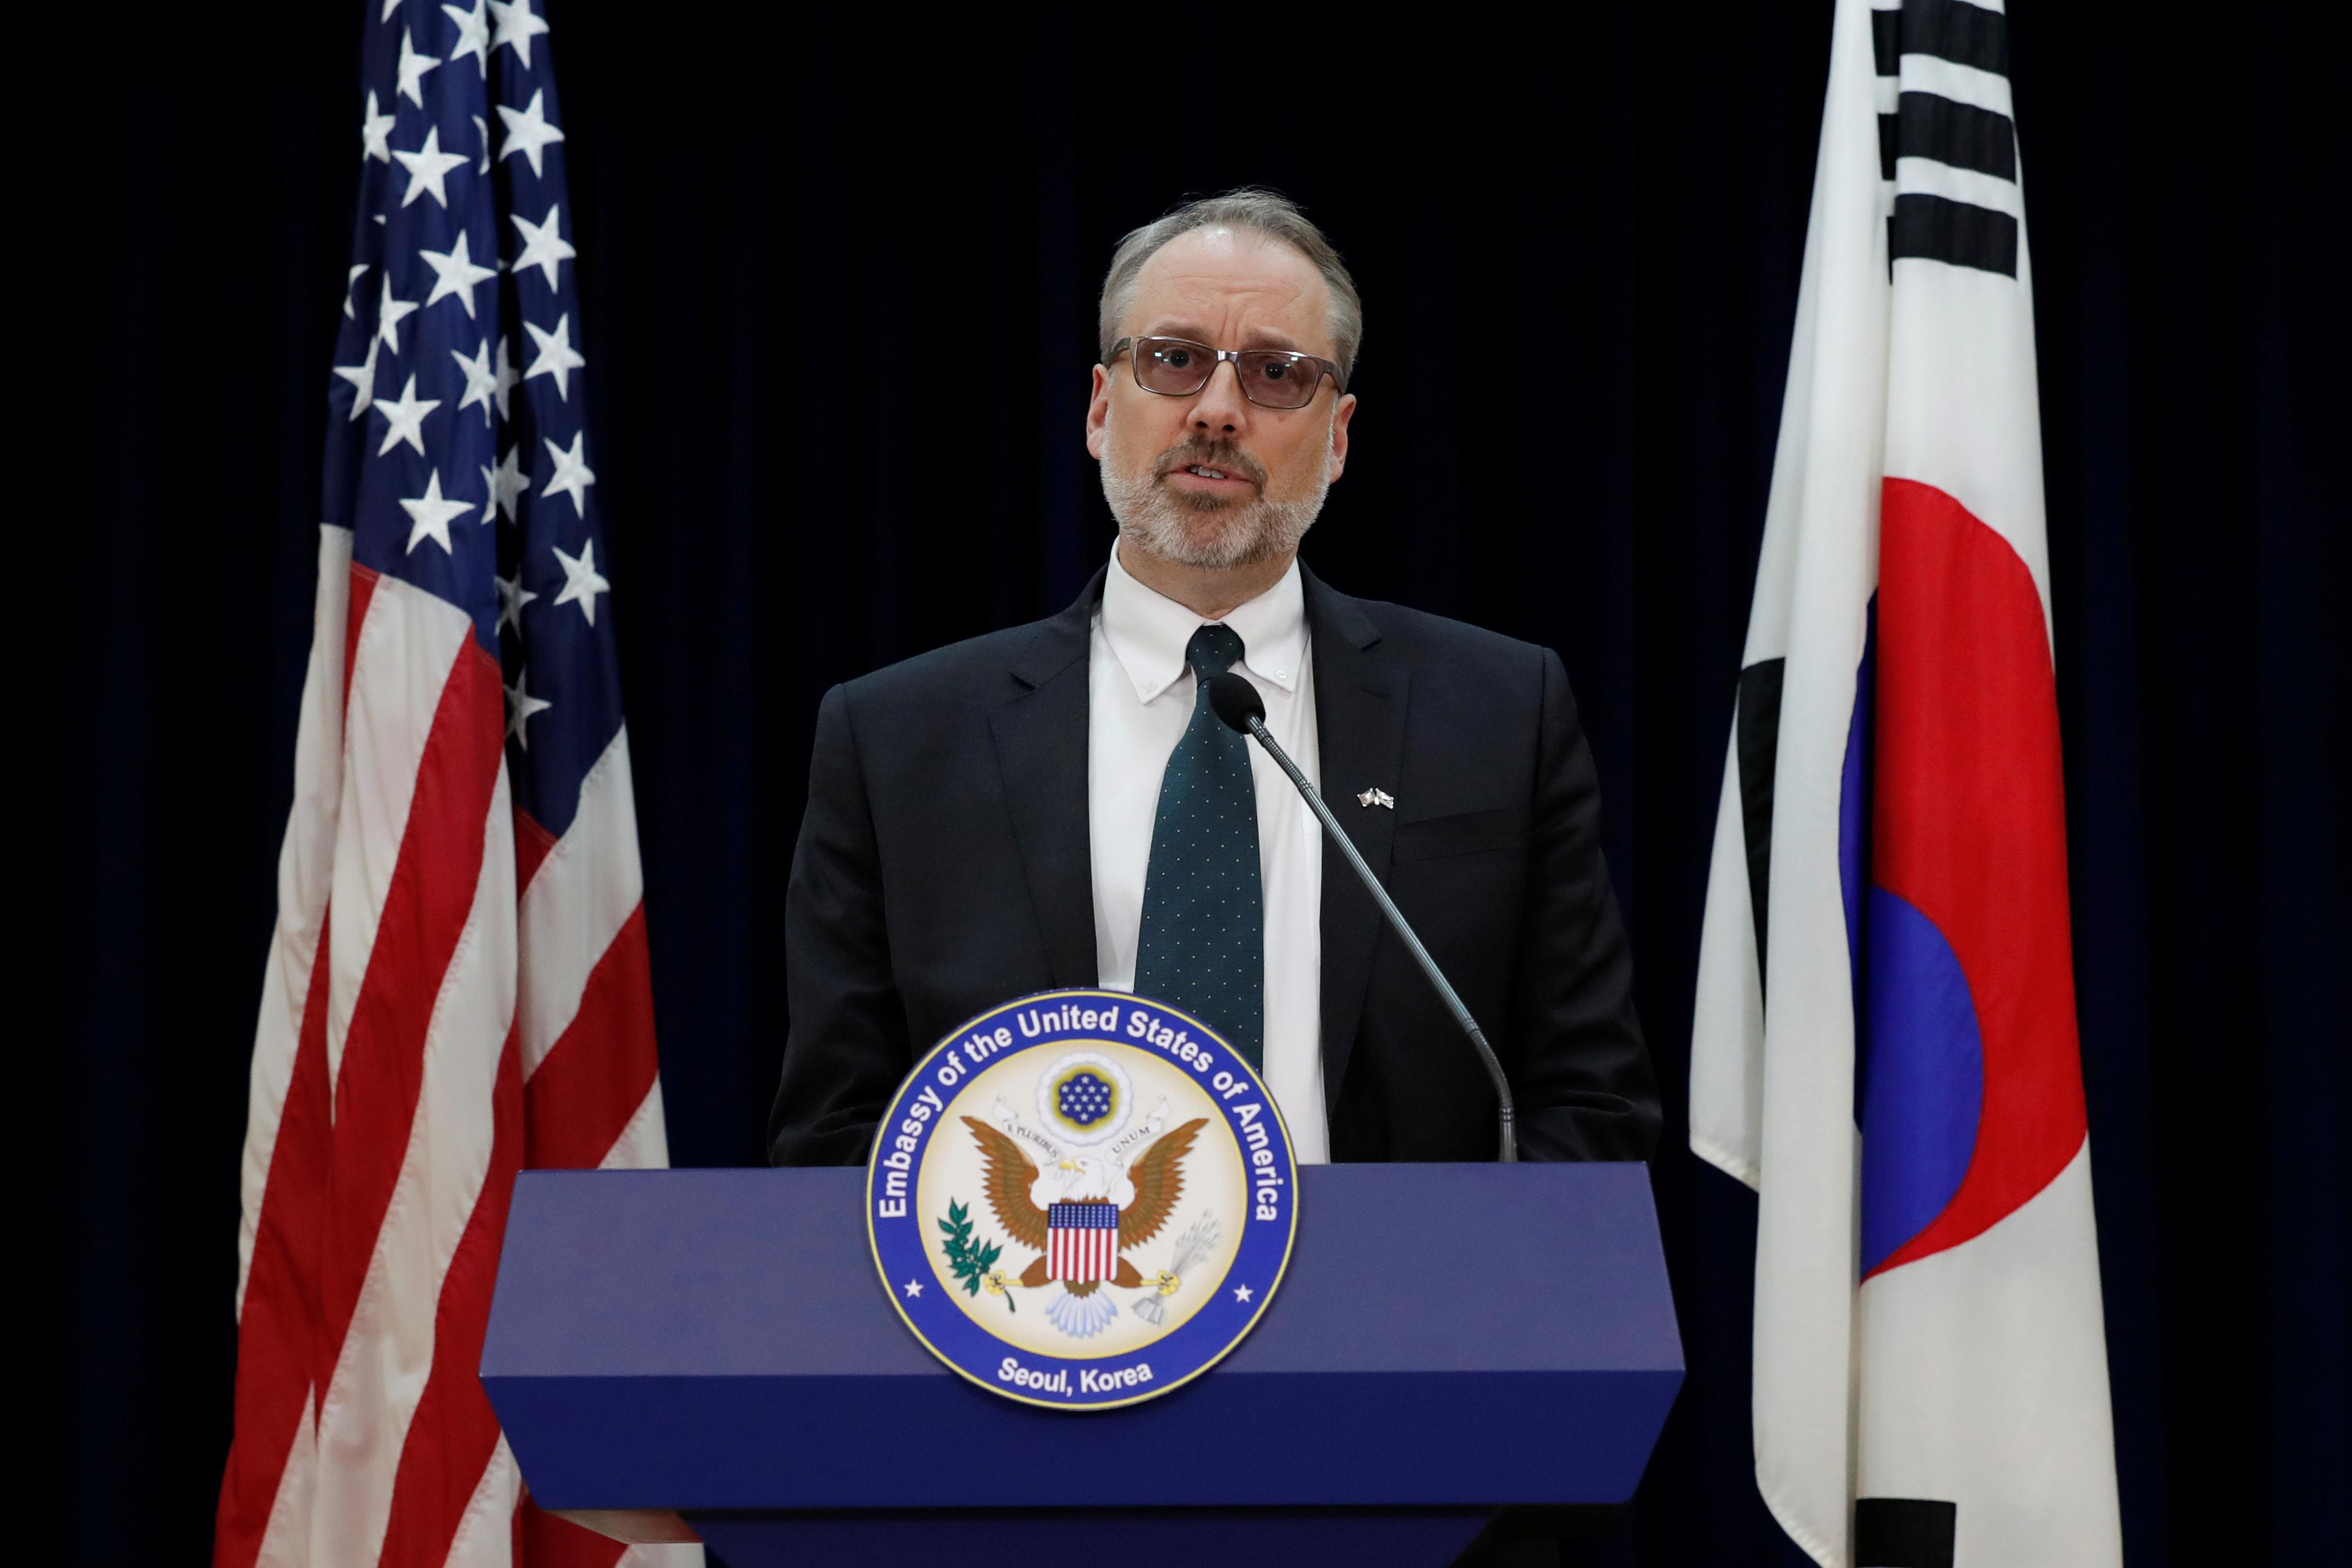 U.S. breaks off defense cost talks, as South Korea balks at $5...